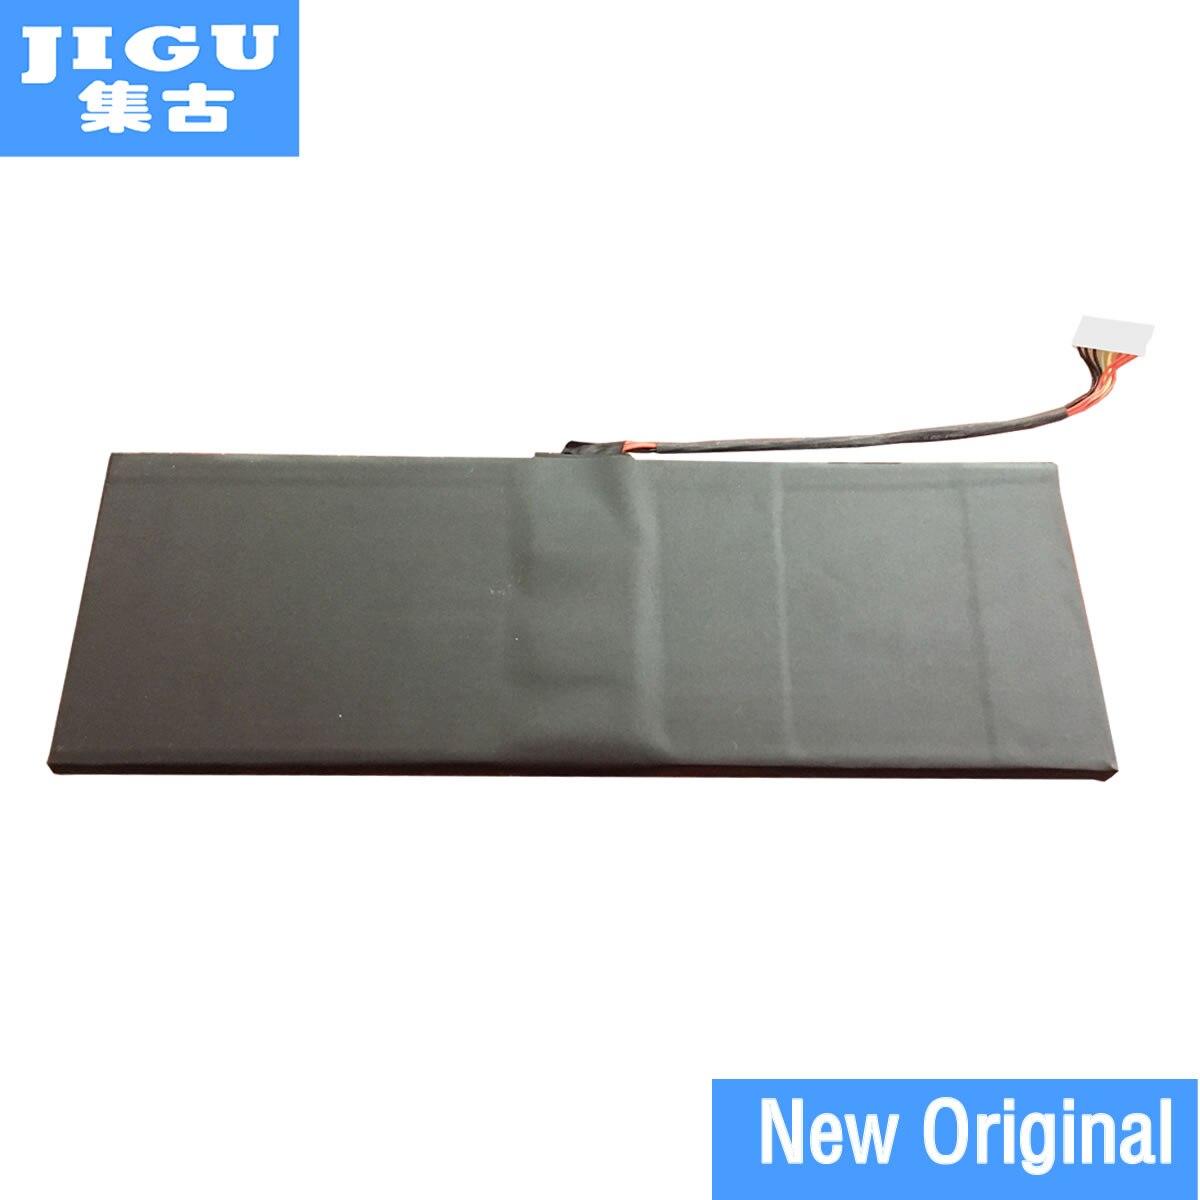 JIGU Original laptop battery 916TA013F GNC-J40 for SCHENKER XMG C504 FOR GIGABYTE P34 V4 P34G v2 P34W v3 v4 gnc 300mg 100